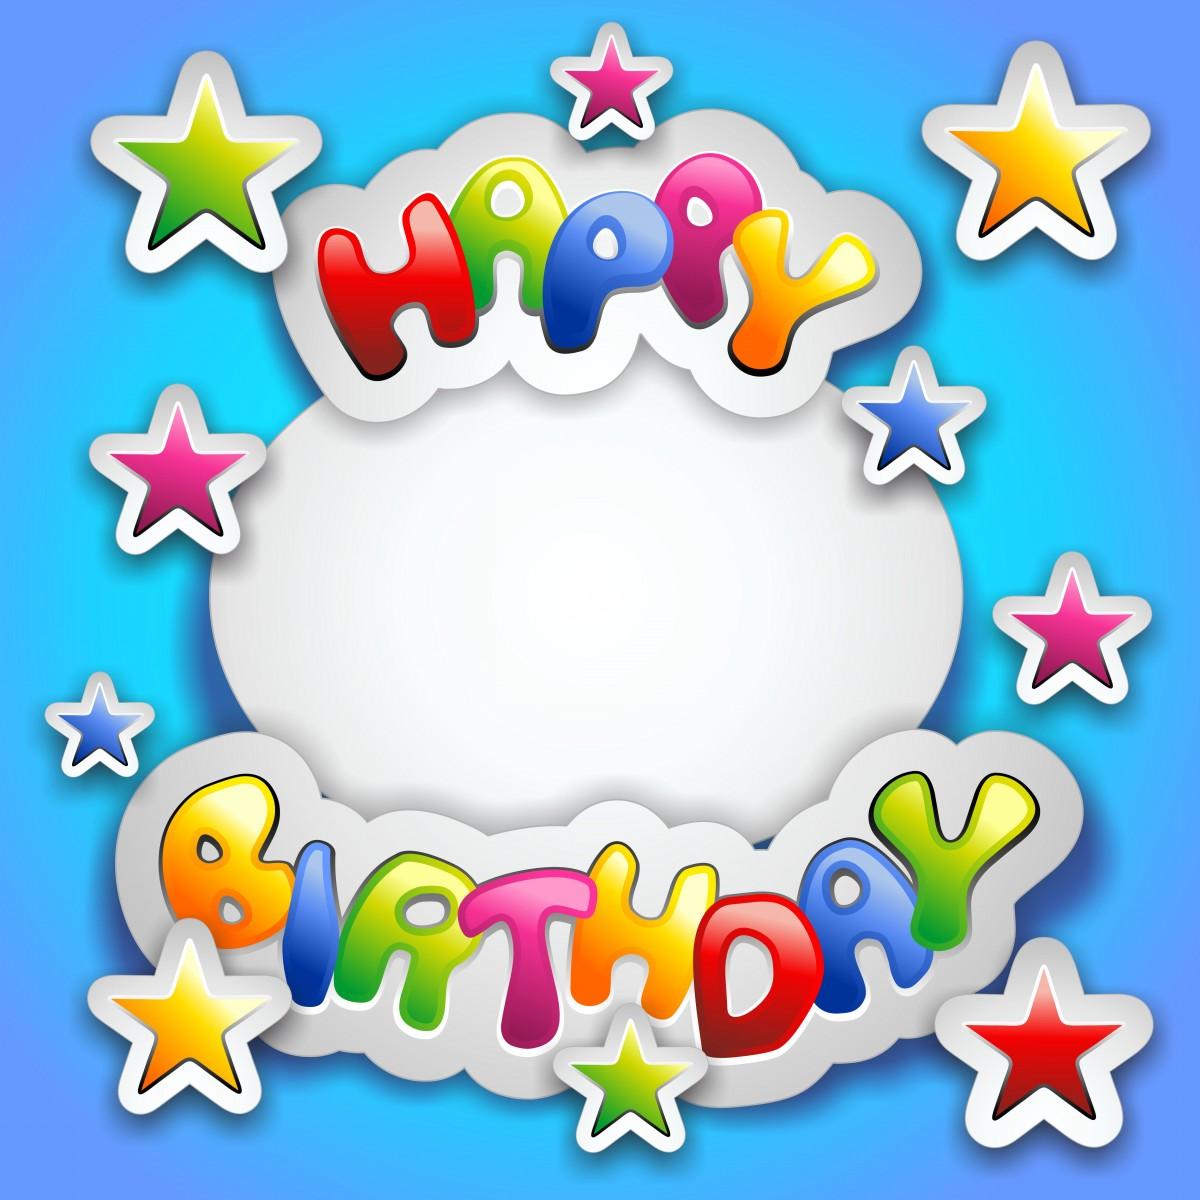 Happy Birthday Greetings for Children 10 Unique Free Cards Elsoar – Children Birthday Cards